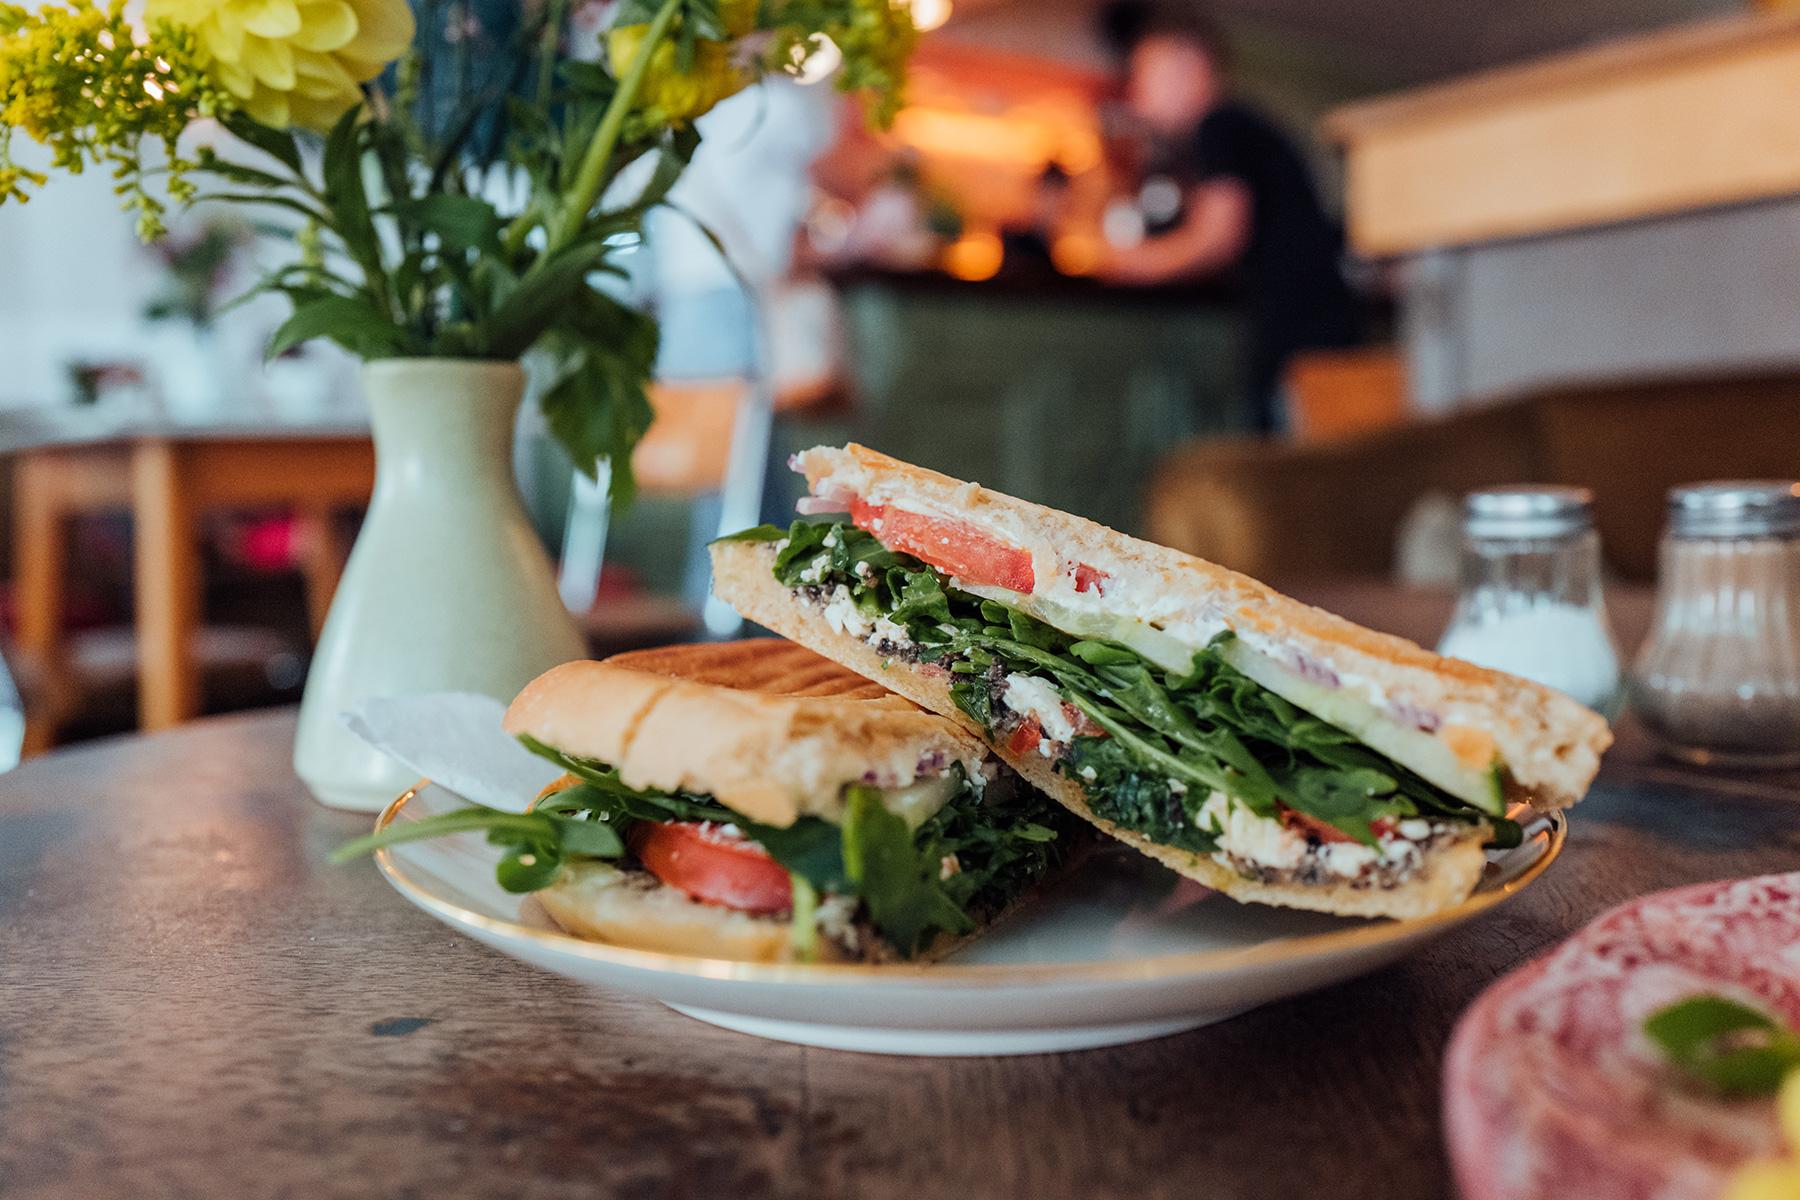 Kraweel StPauli cafe geheimtipp hamburg lisa knauer 04